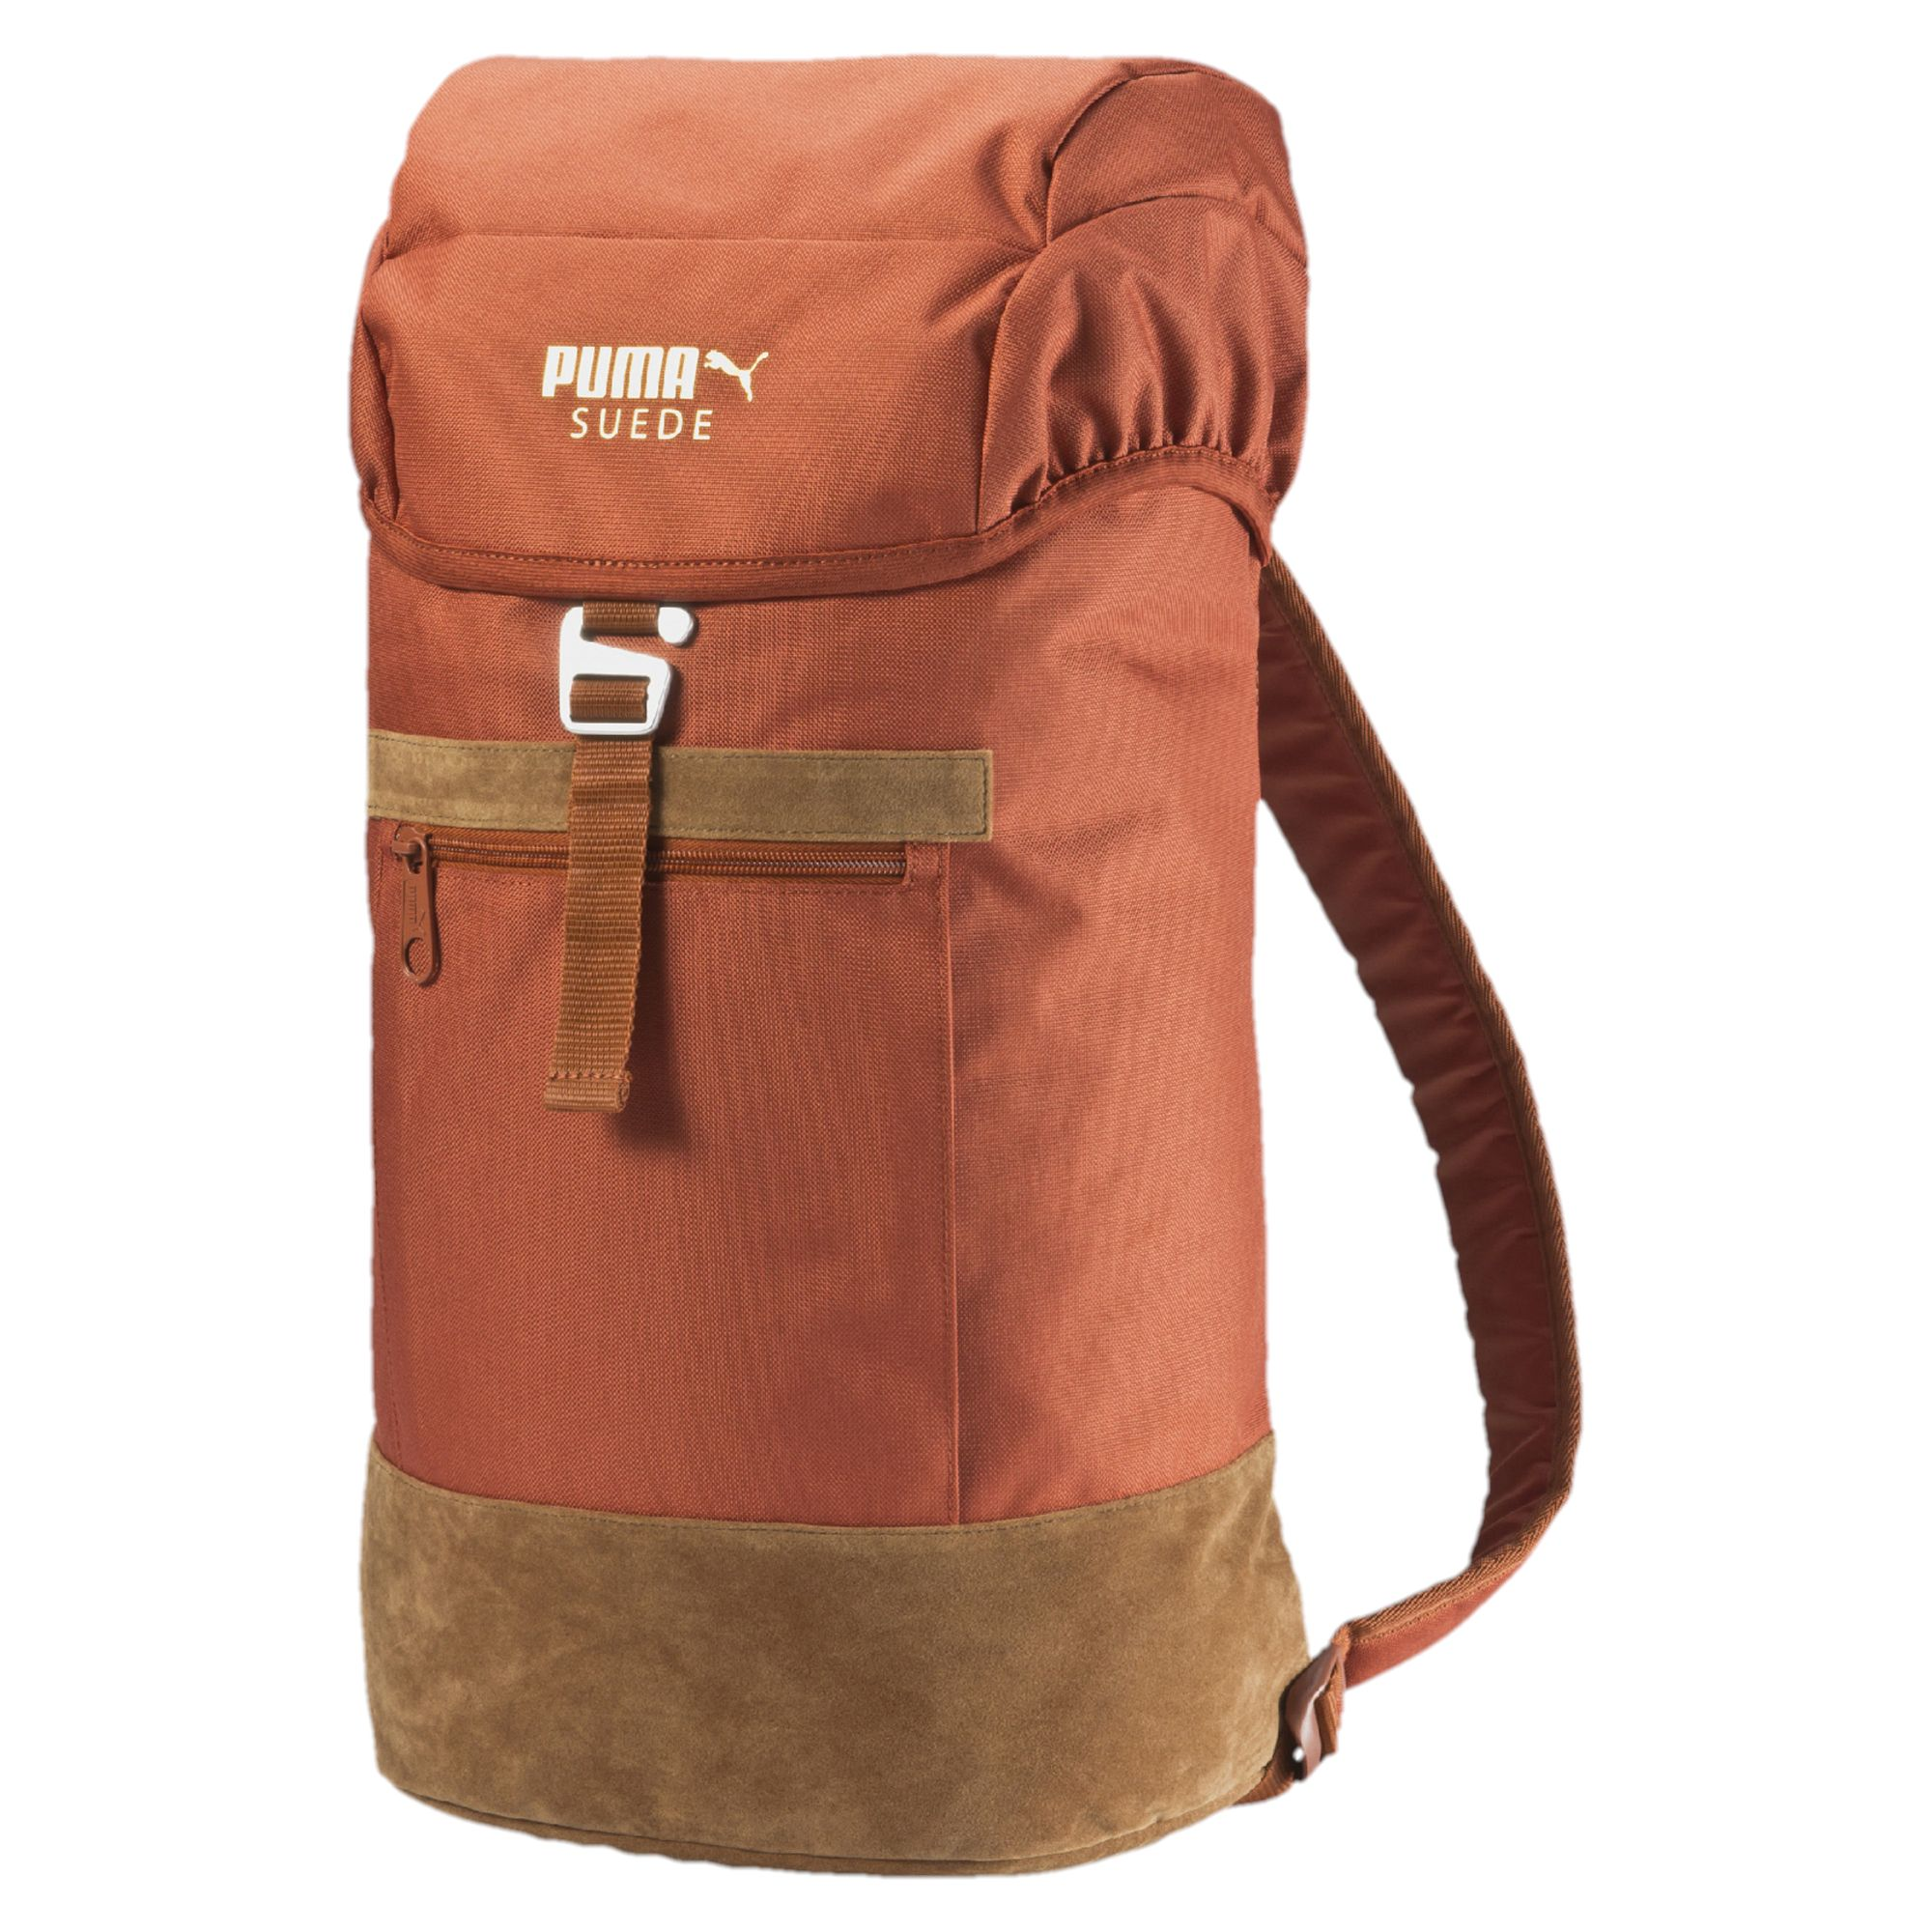 puma suede rucksack